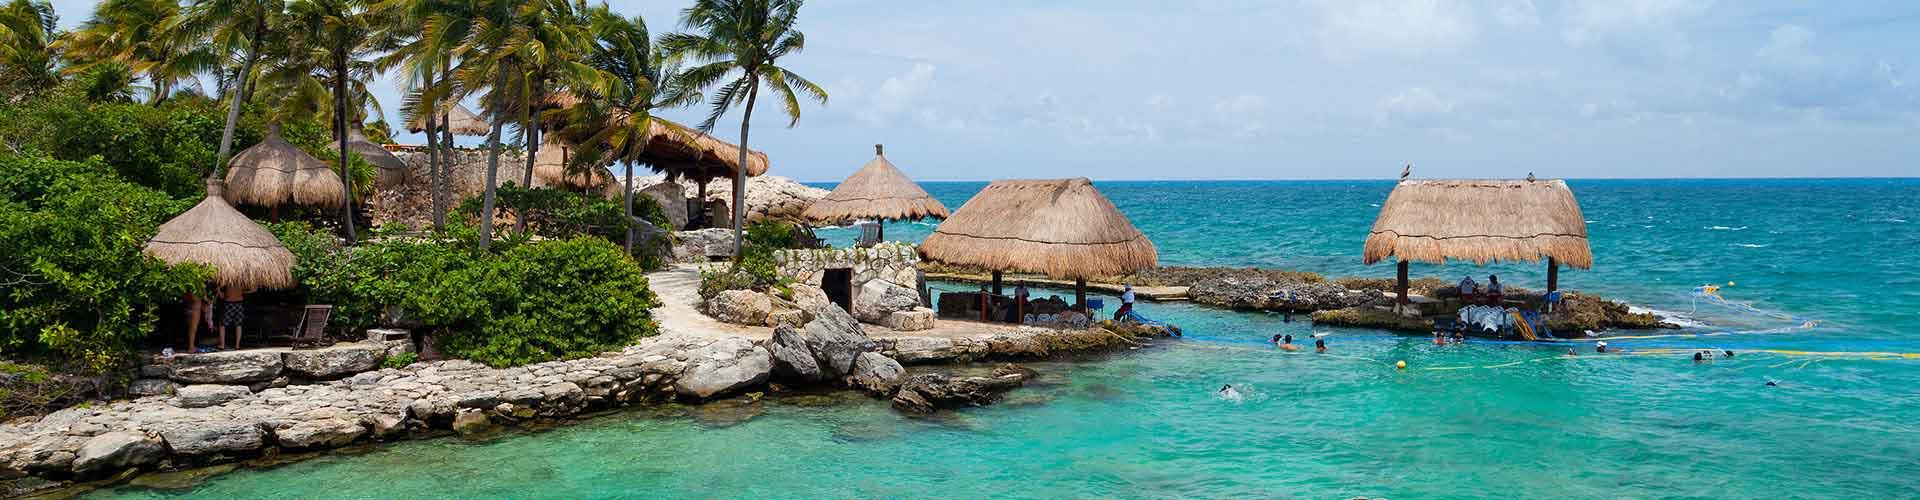 Cancun – Hostels em Cancun. Mapas para Cancun, Fotos e Avaliações para cada Hostels em Cancun.